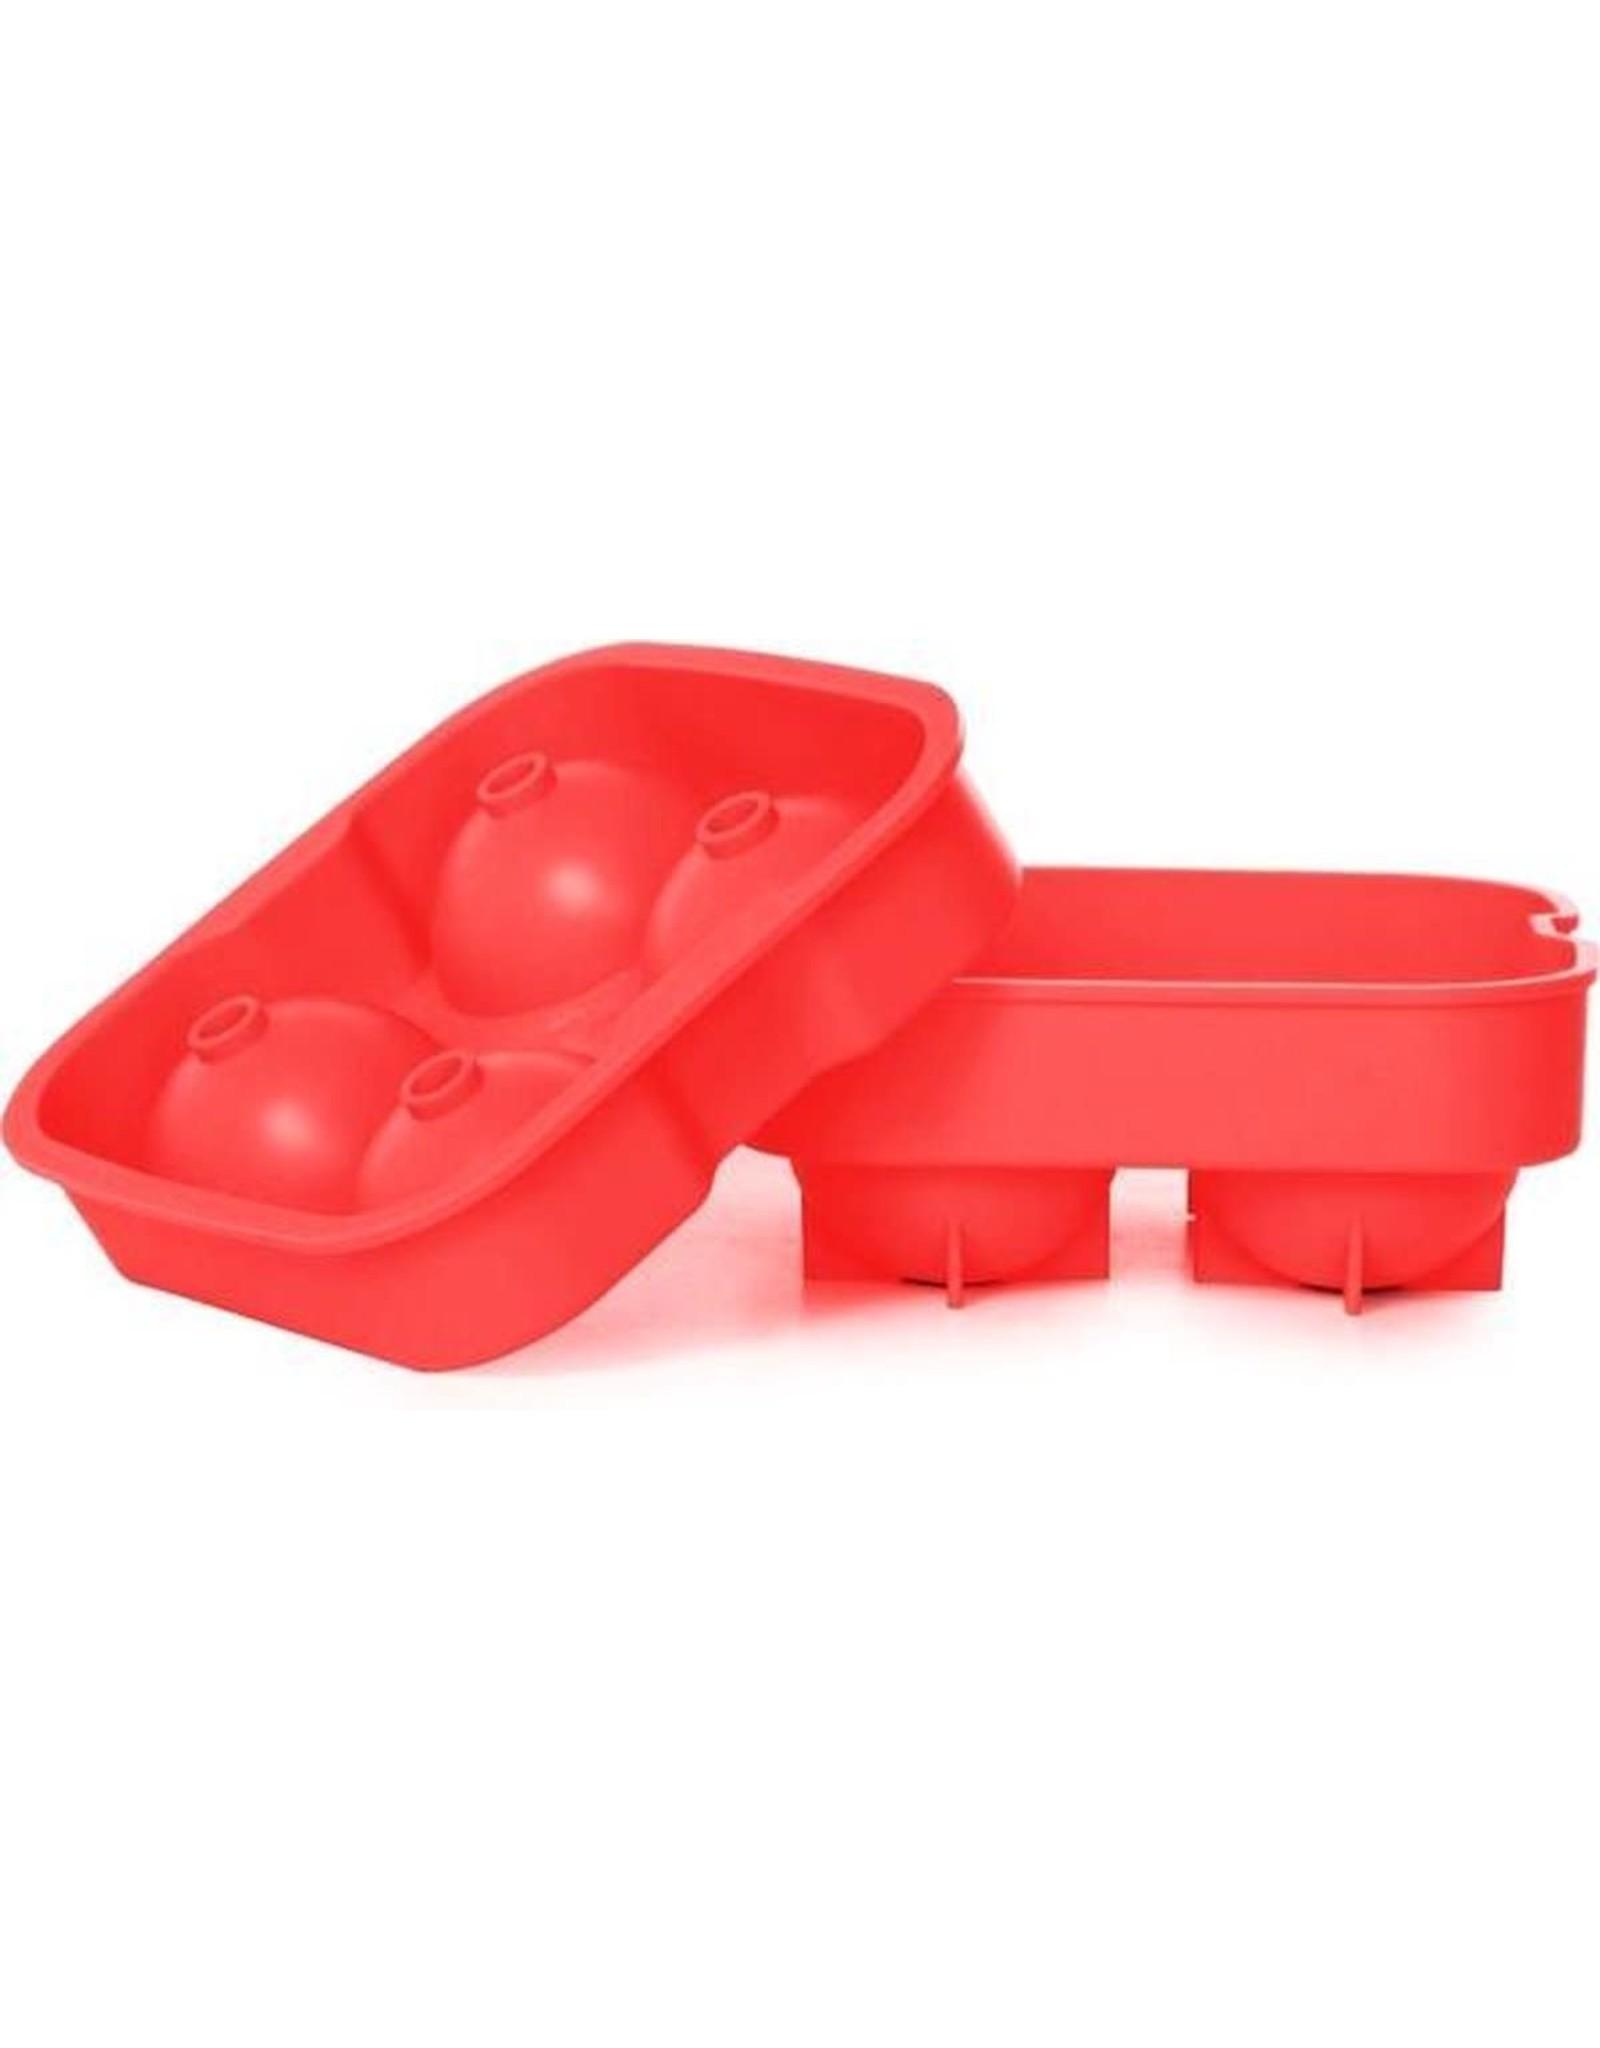 C&T Ijsblokjesvorm rond siliconen rood 4/st